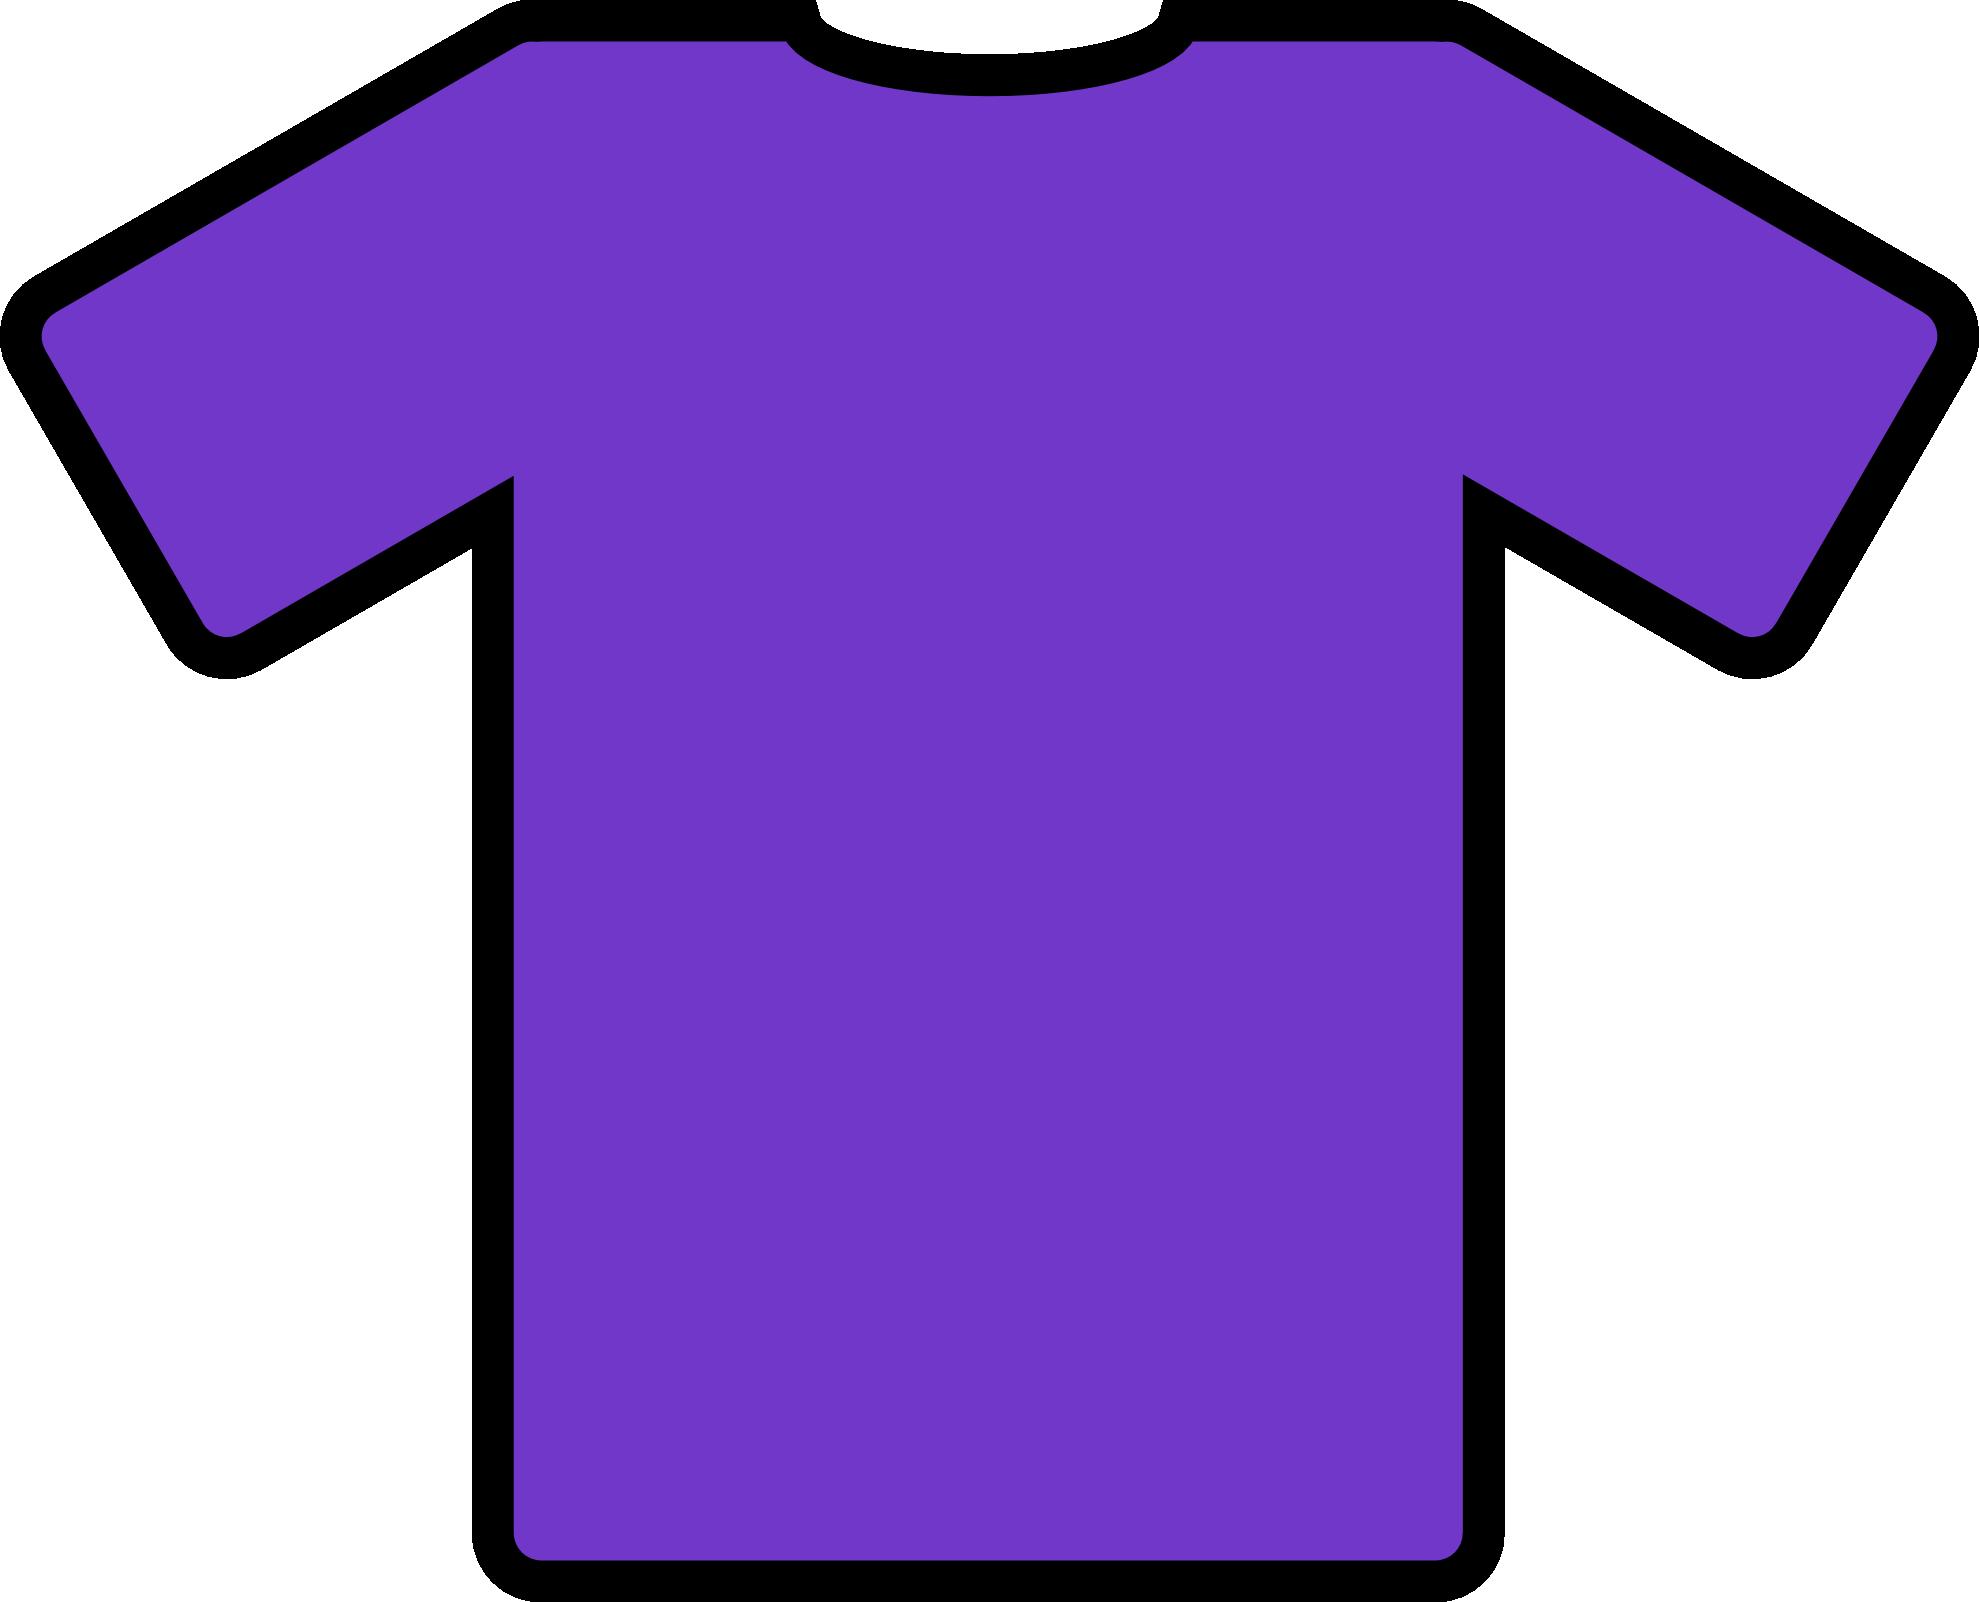 Purple Dress clipart #4, Download drawings